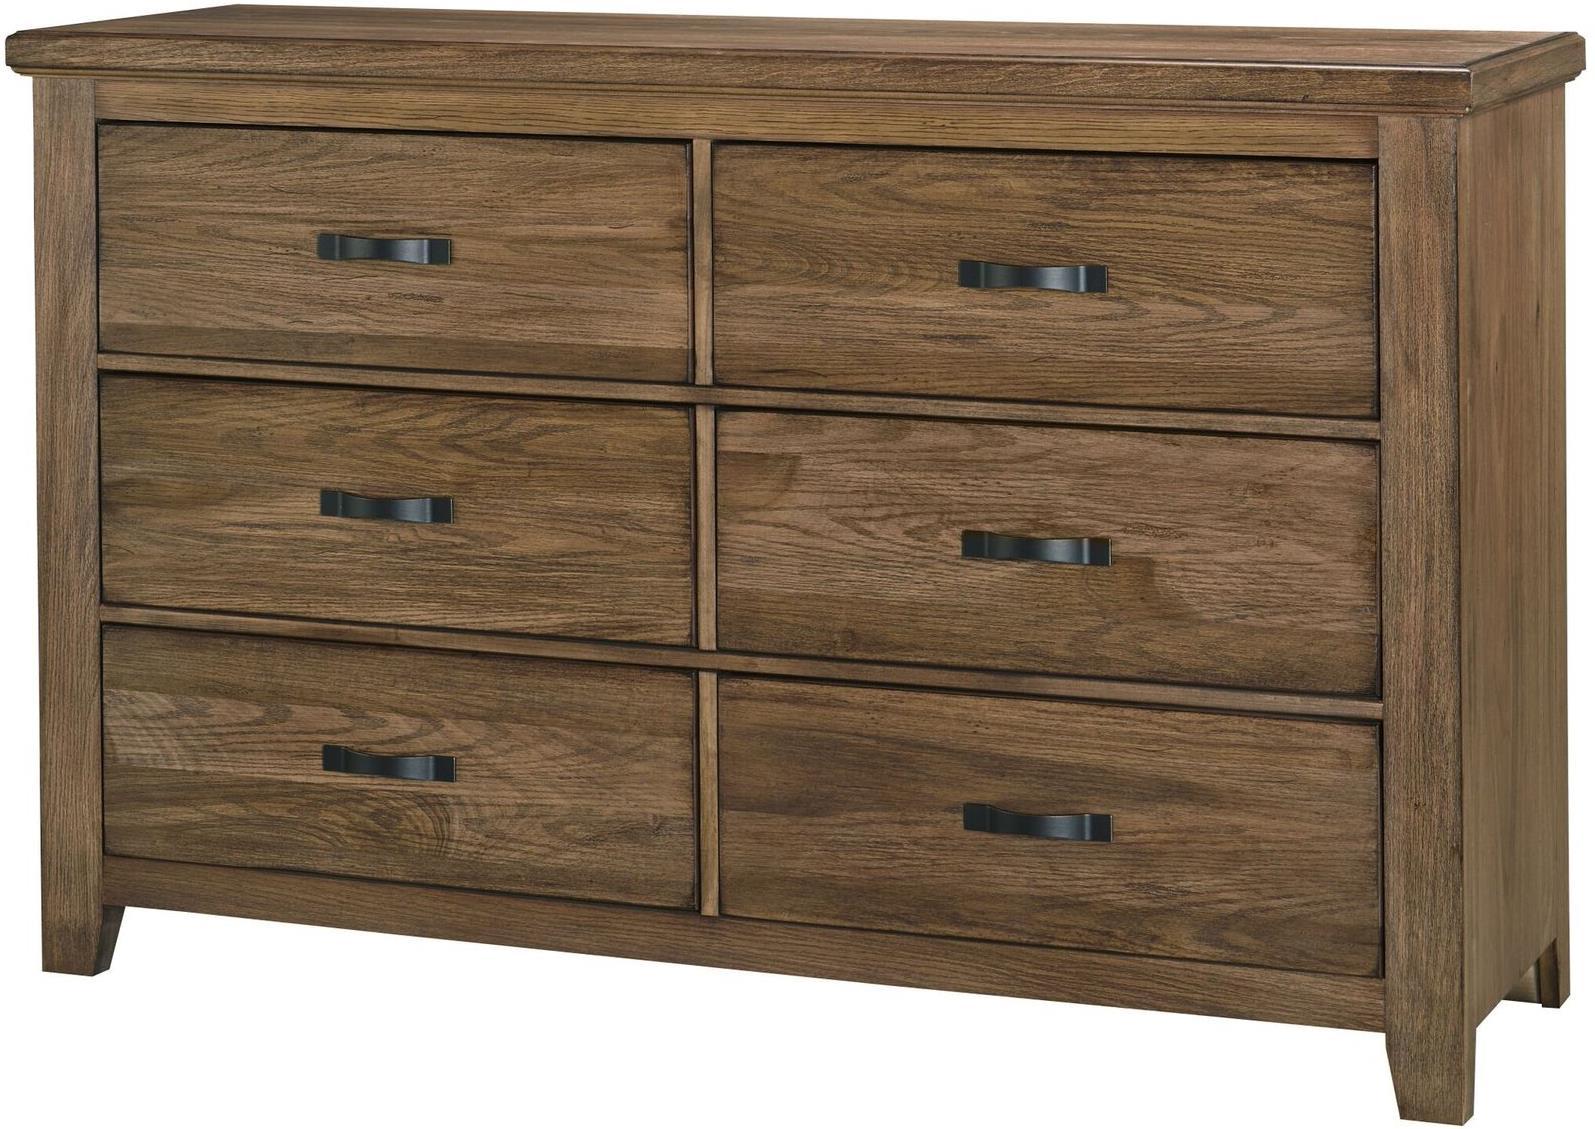 Vaughan Bassett Gramercy Park Storage Dresser-6 Drawer - Item Number: 514-002